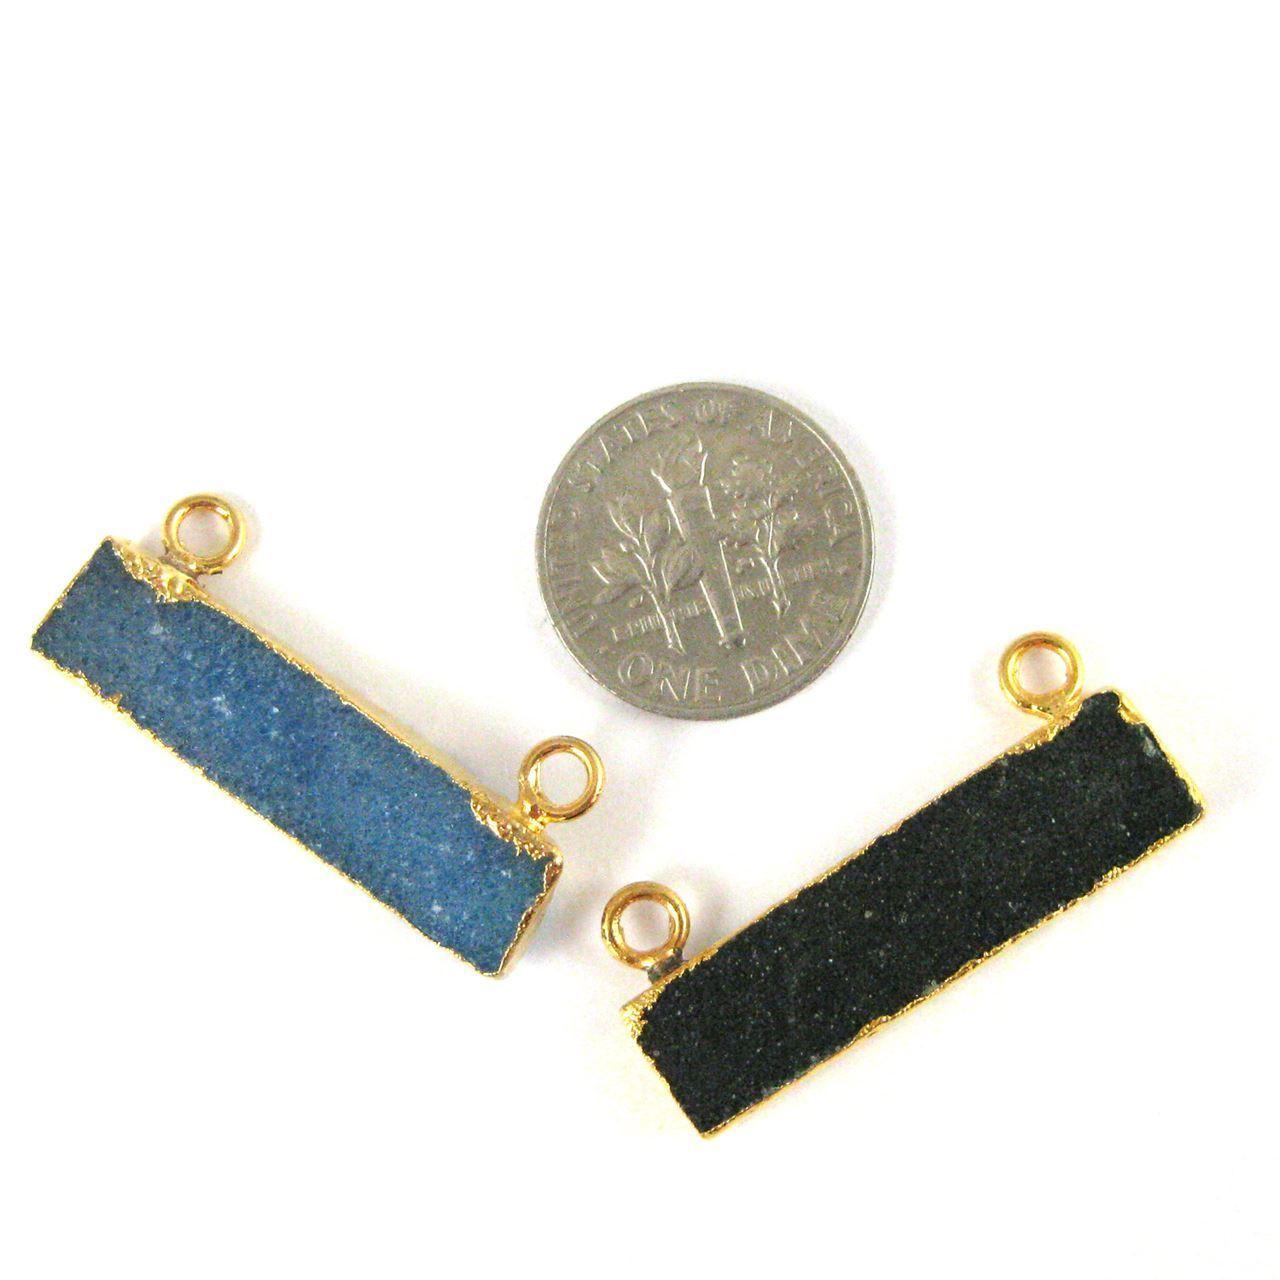 Natural Druzy Agate Bar Connector Pendant, 24K Gold plated Long Horizontal Bar-Black